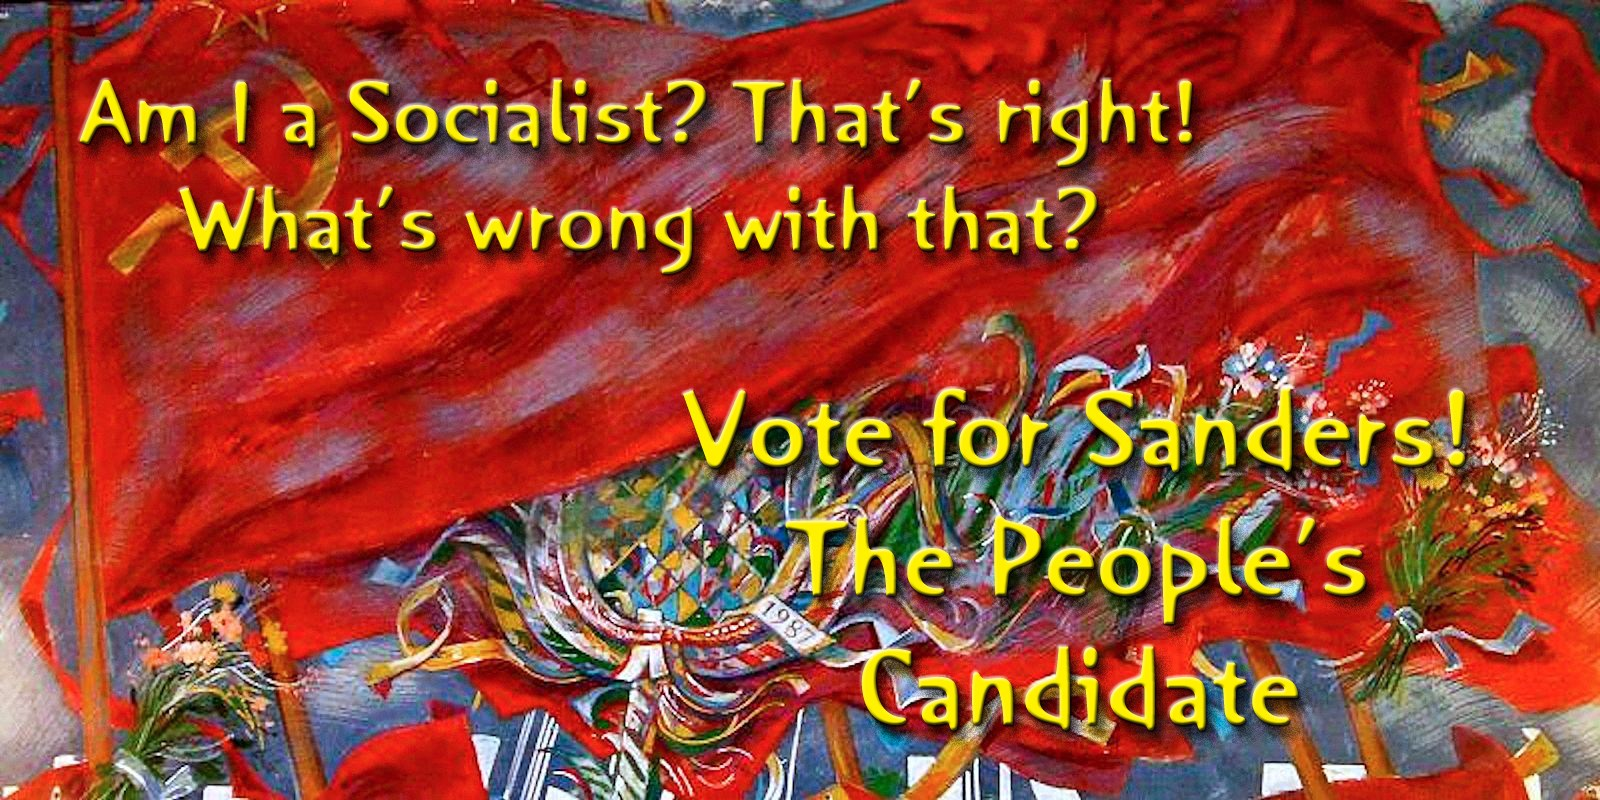 00 Am I a Socialist. 07.05.15